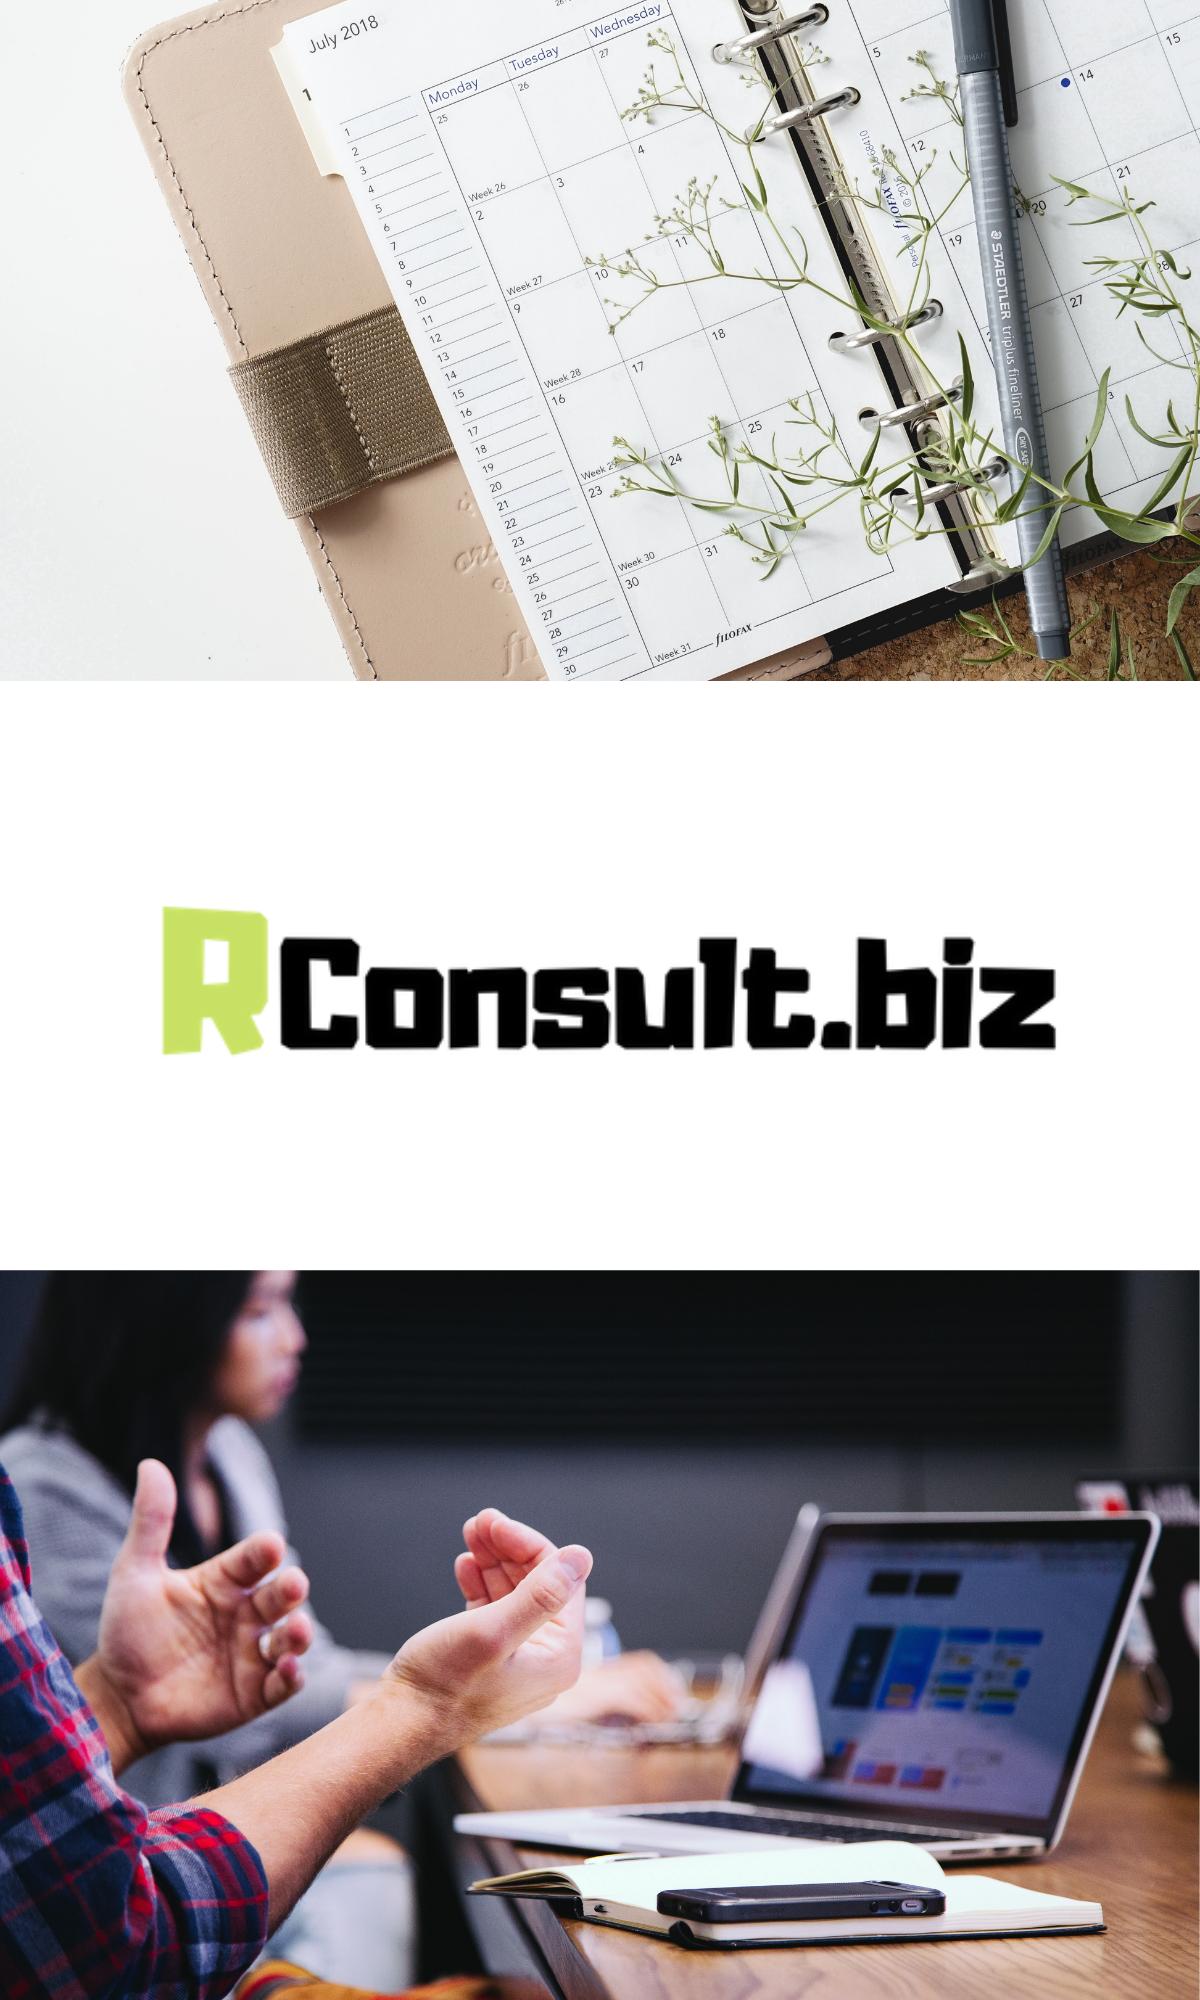 RConsult.biz als Arbeitgeber